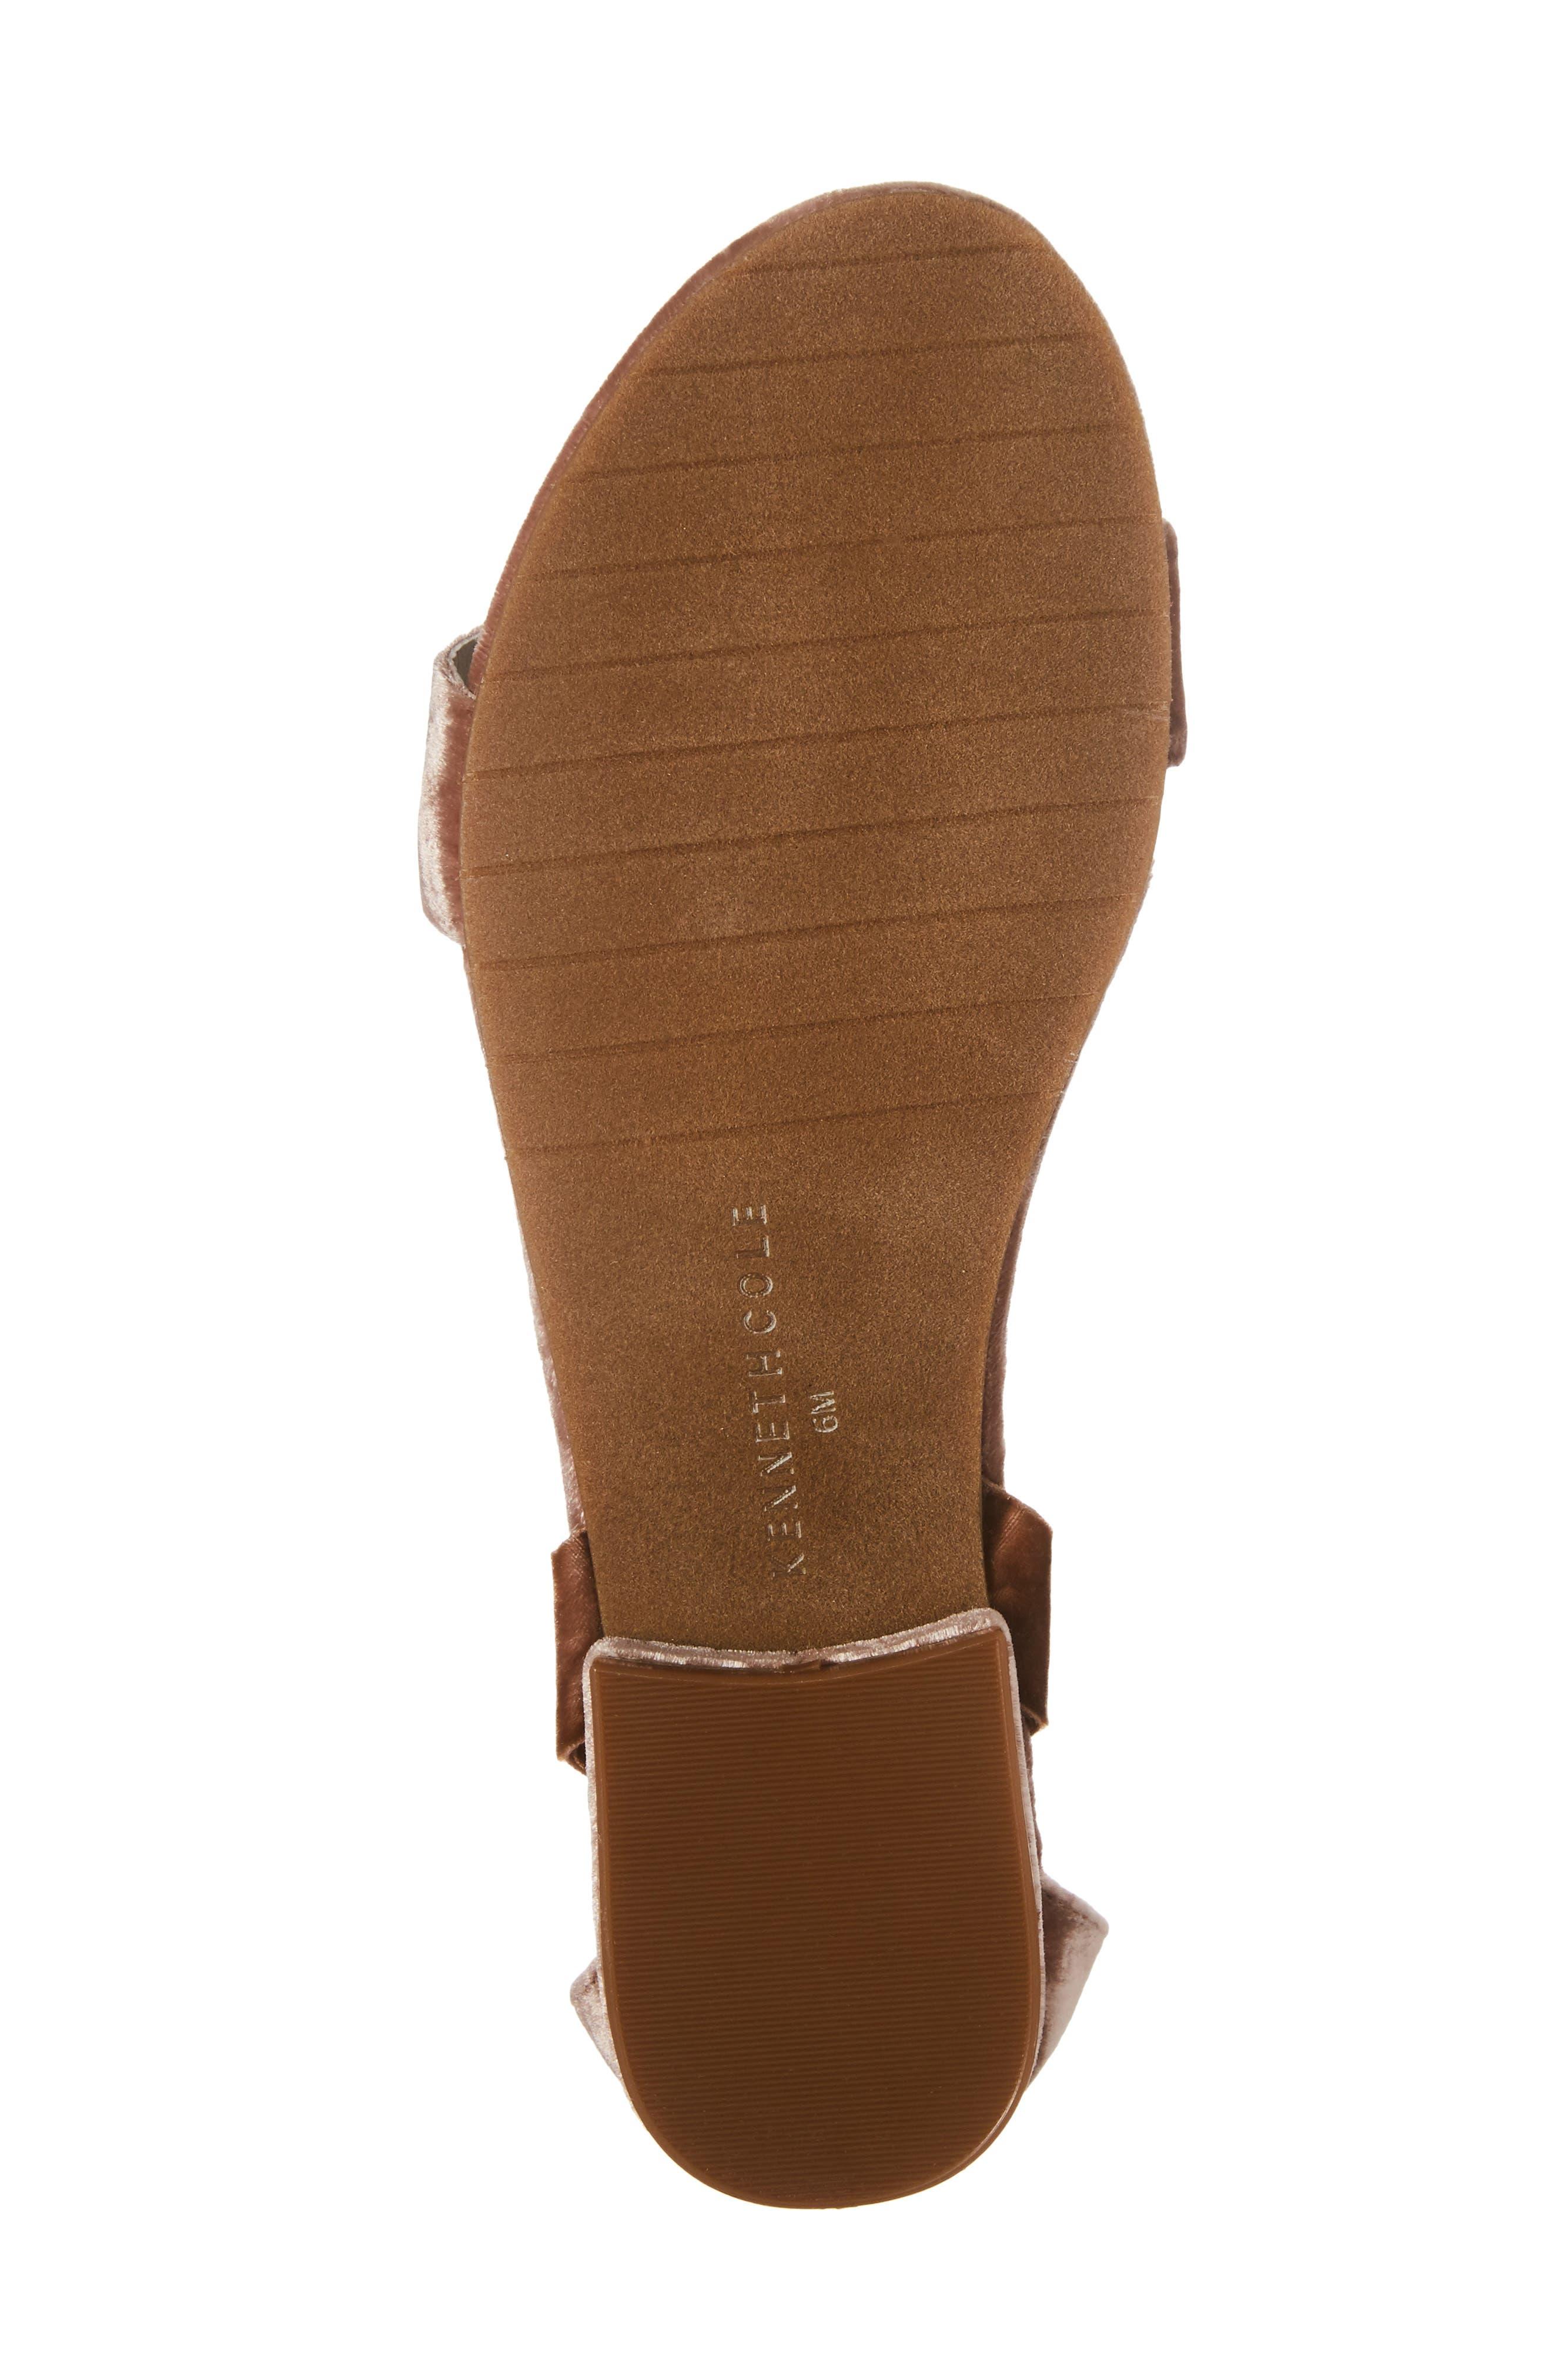 Valen Tassel Lace-Up Sandal,                             Alternate thumbnail 73, color,